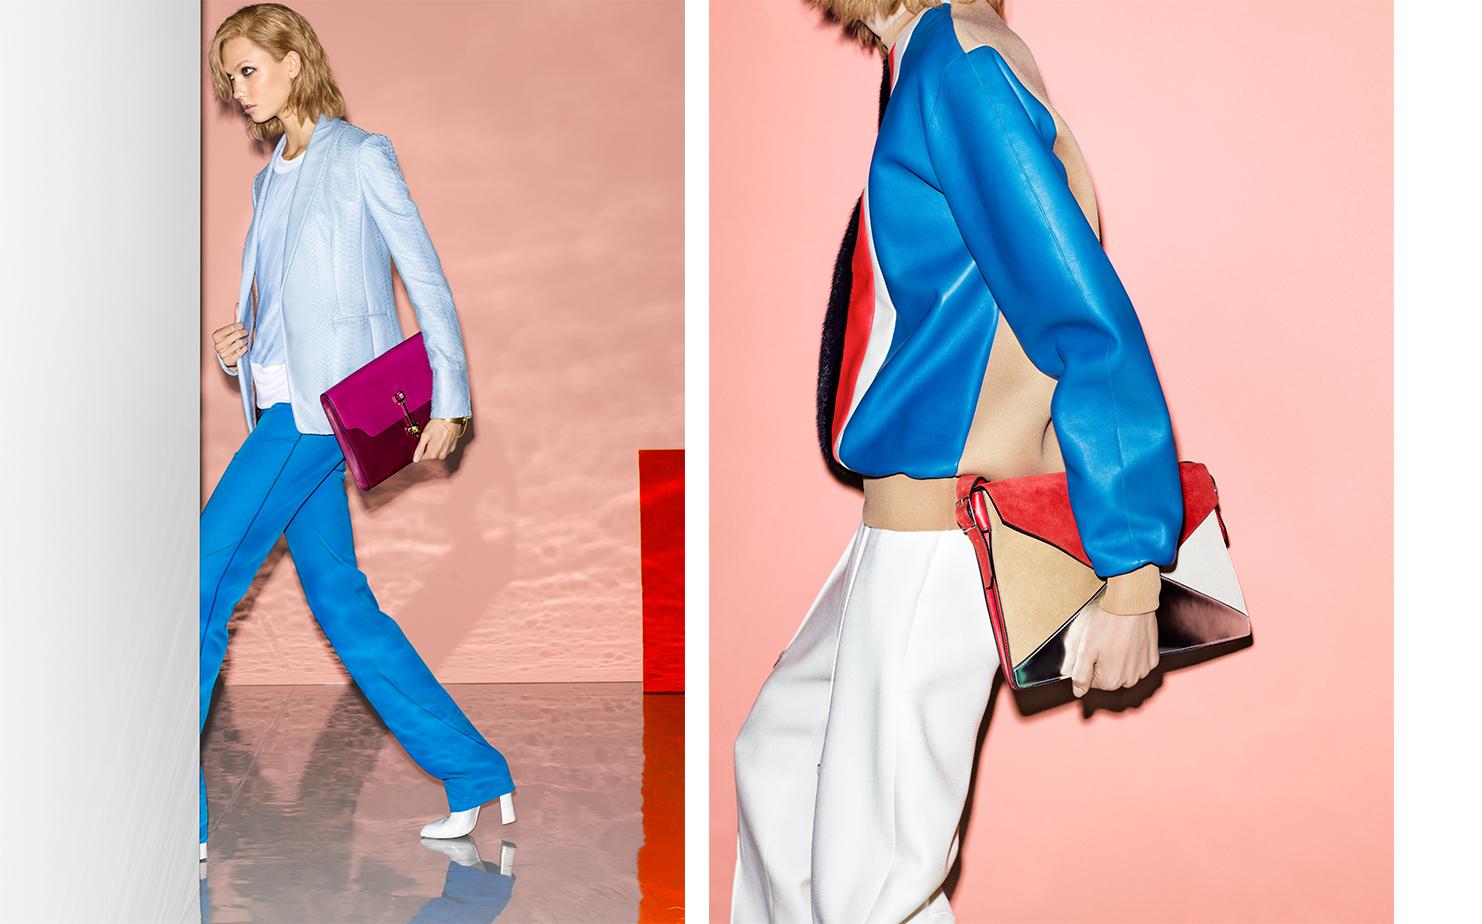 Vogue WHAT TO WEAR WHERE   FASHION EDITOR Elissa Santisi MODEL Karlie Kloss